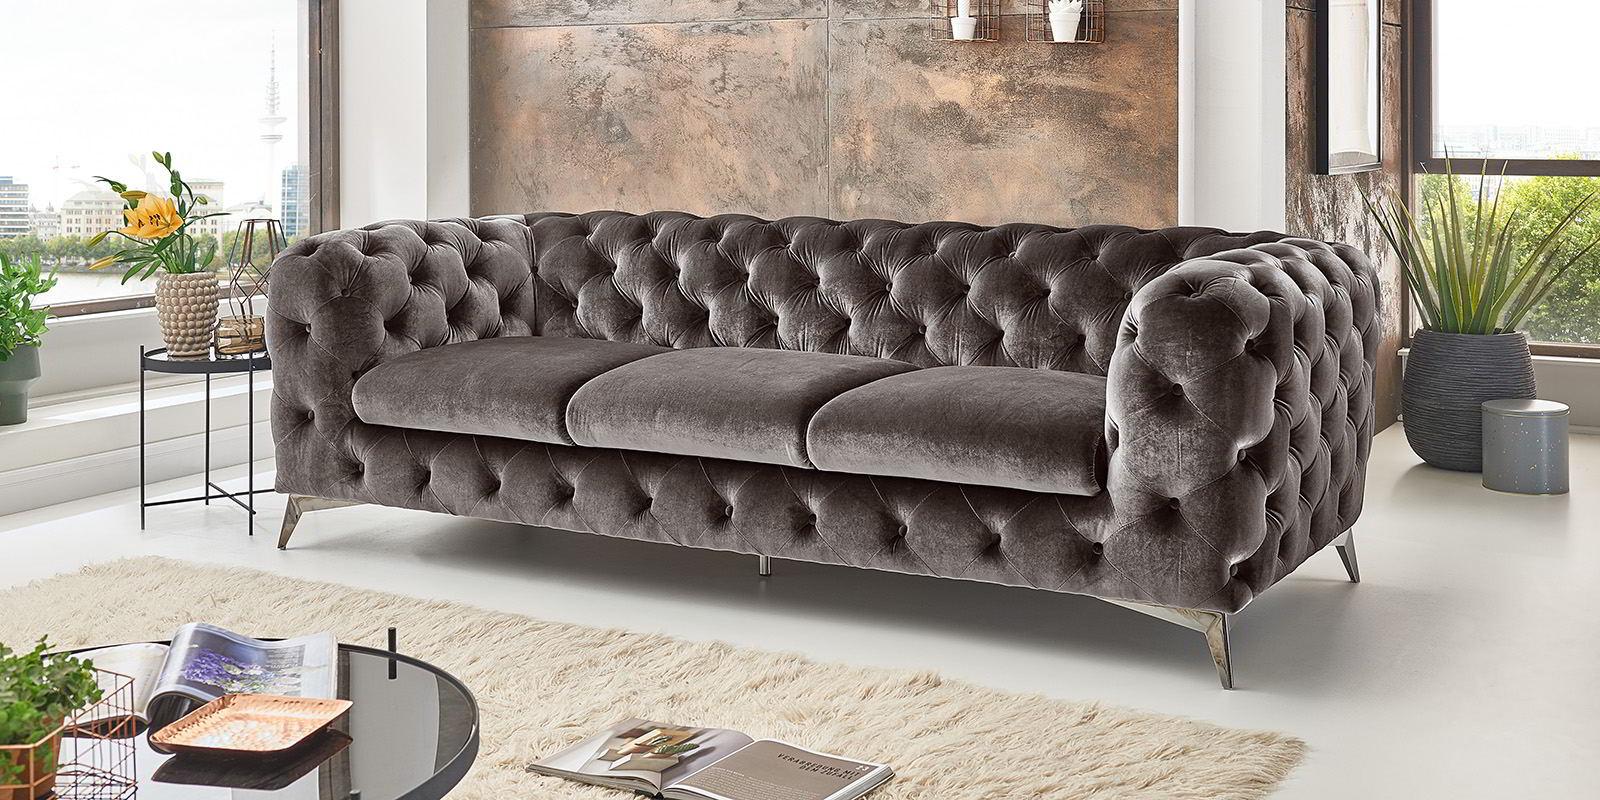 Full Size of Ikea Couch Grau 3 Sitzer Sofa Louisiana (3 Sitzer Mit Polster Grau) Leder Schlaffunktion Retro Kingsley 3 Sitzer 2 Und Nino Schwarz/grau Rattan Samt Sofa Sofa 3 Sitzer Grau